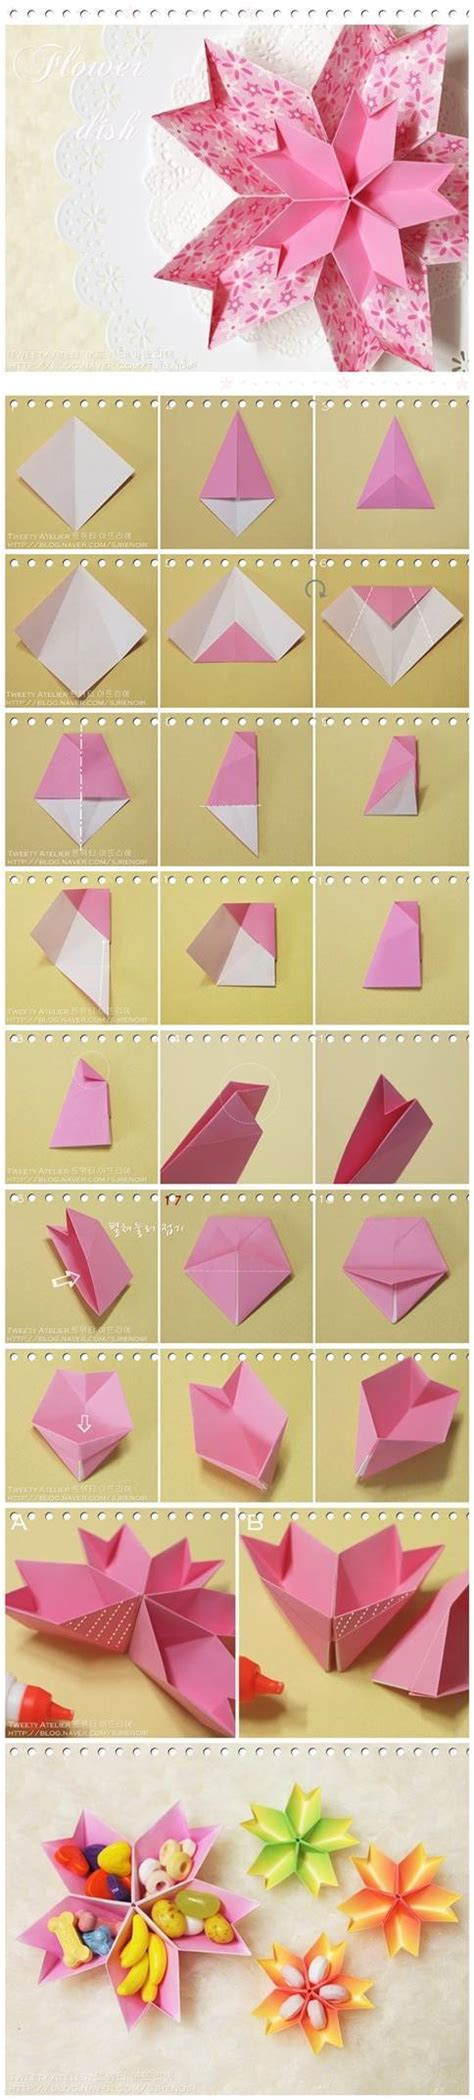 Diy Origami Flowers - diy origami paper flower dish